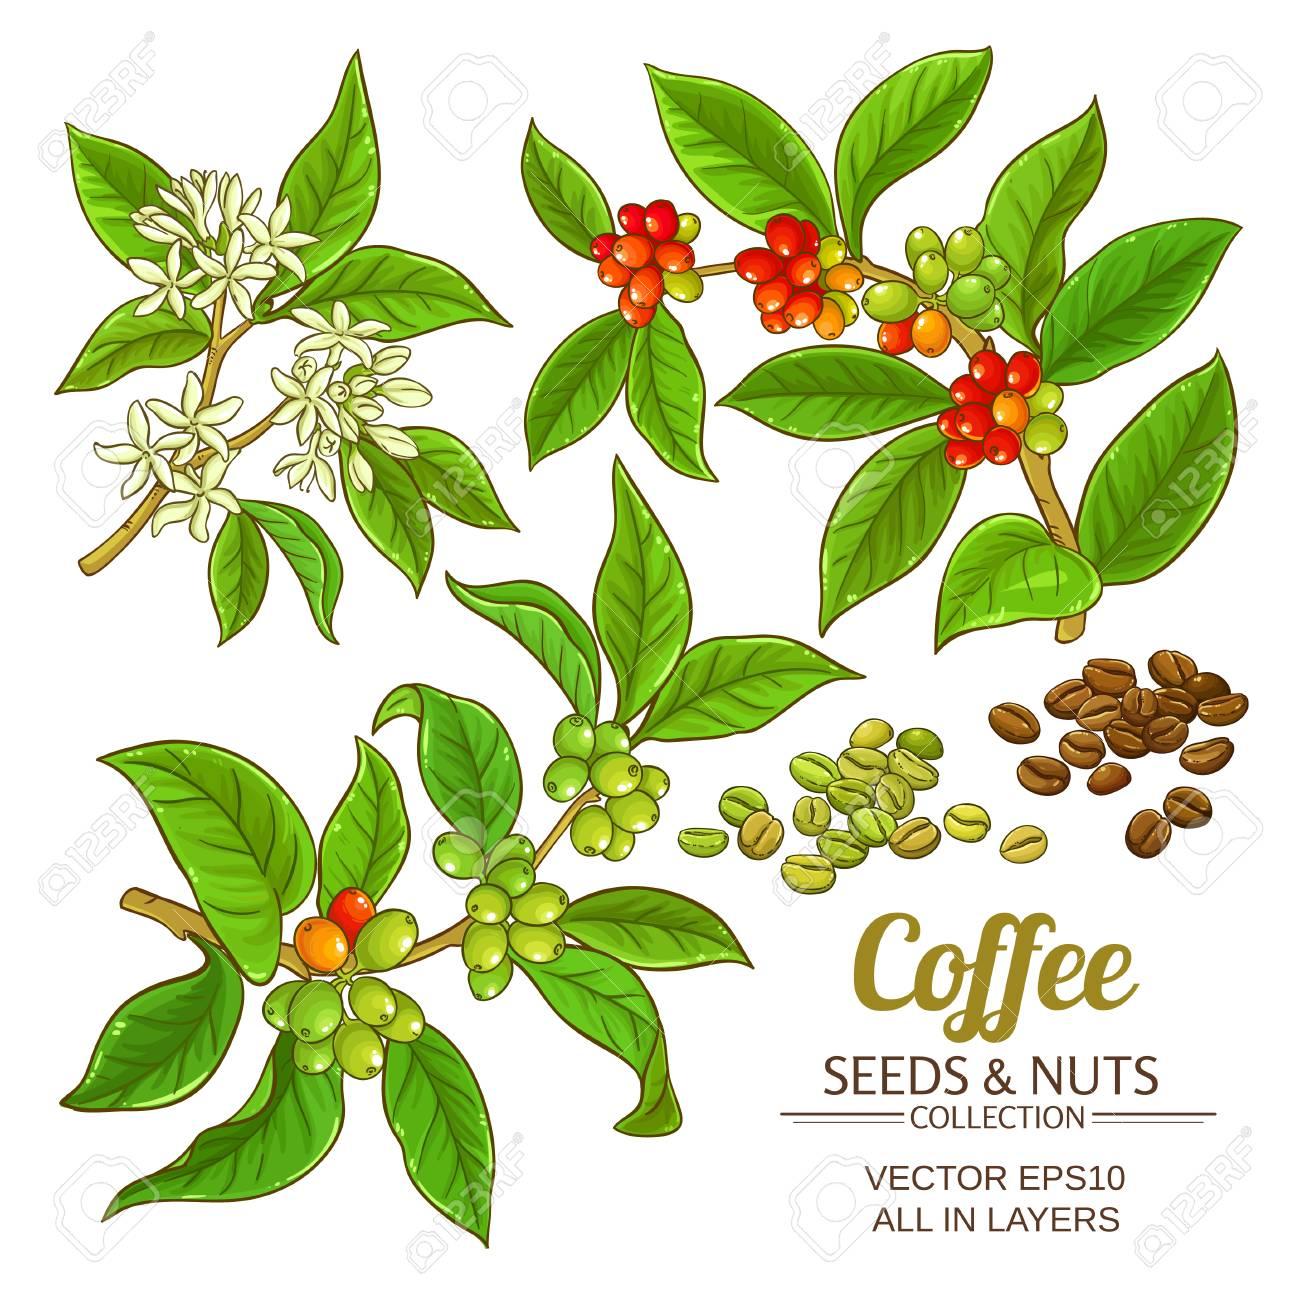 Coffee vector set icon. - 99464707